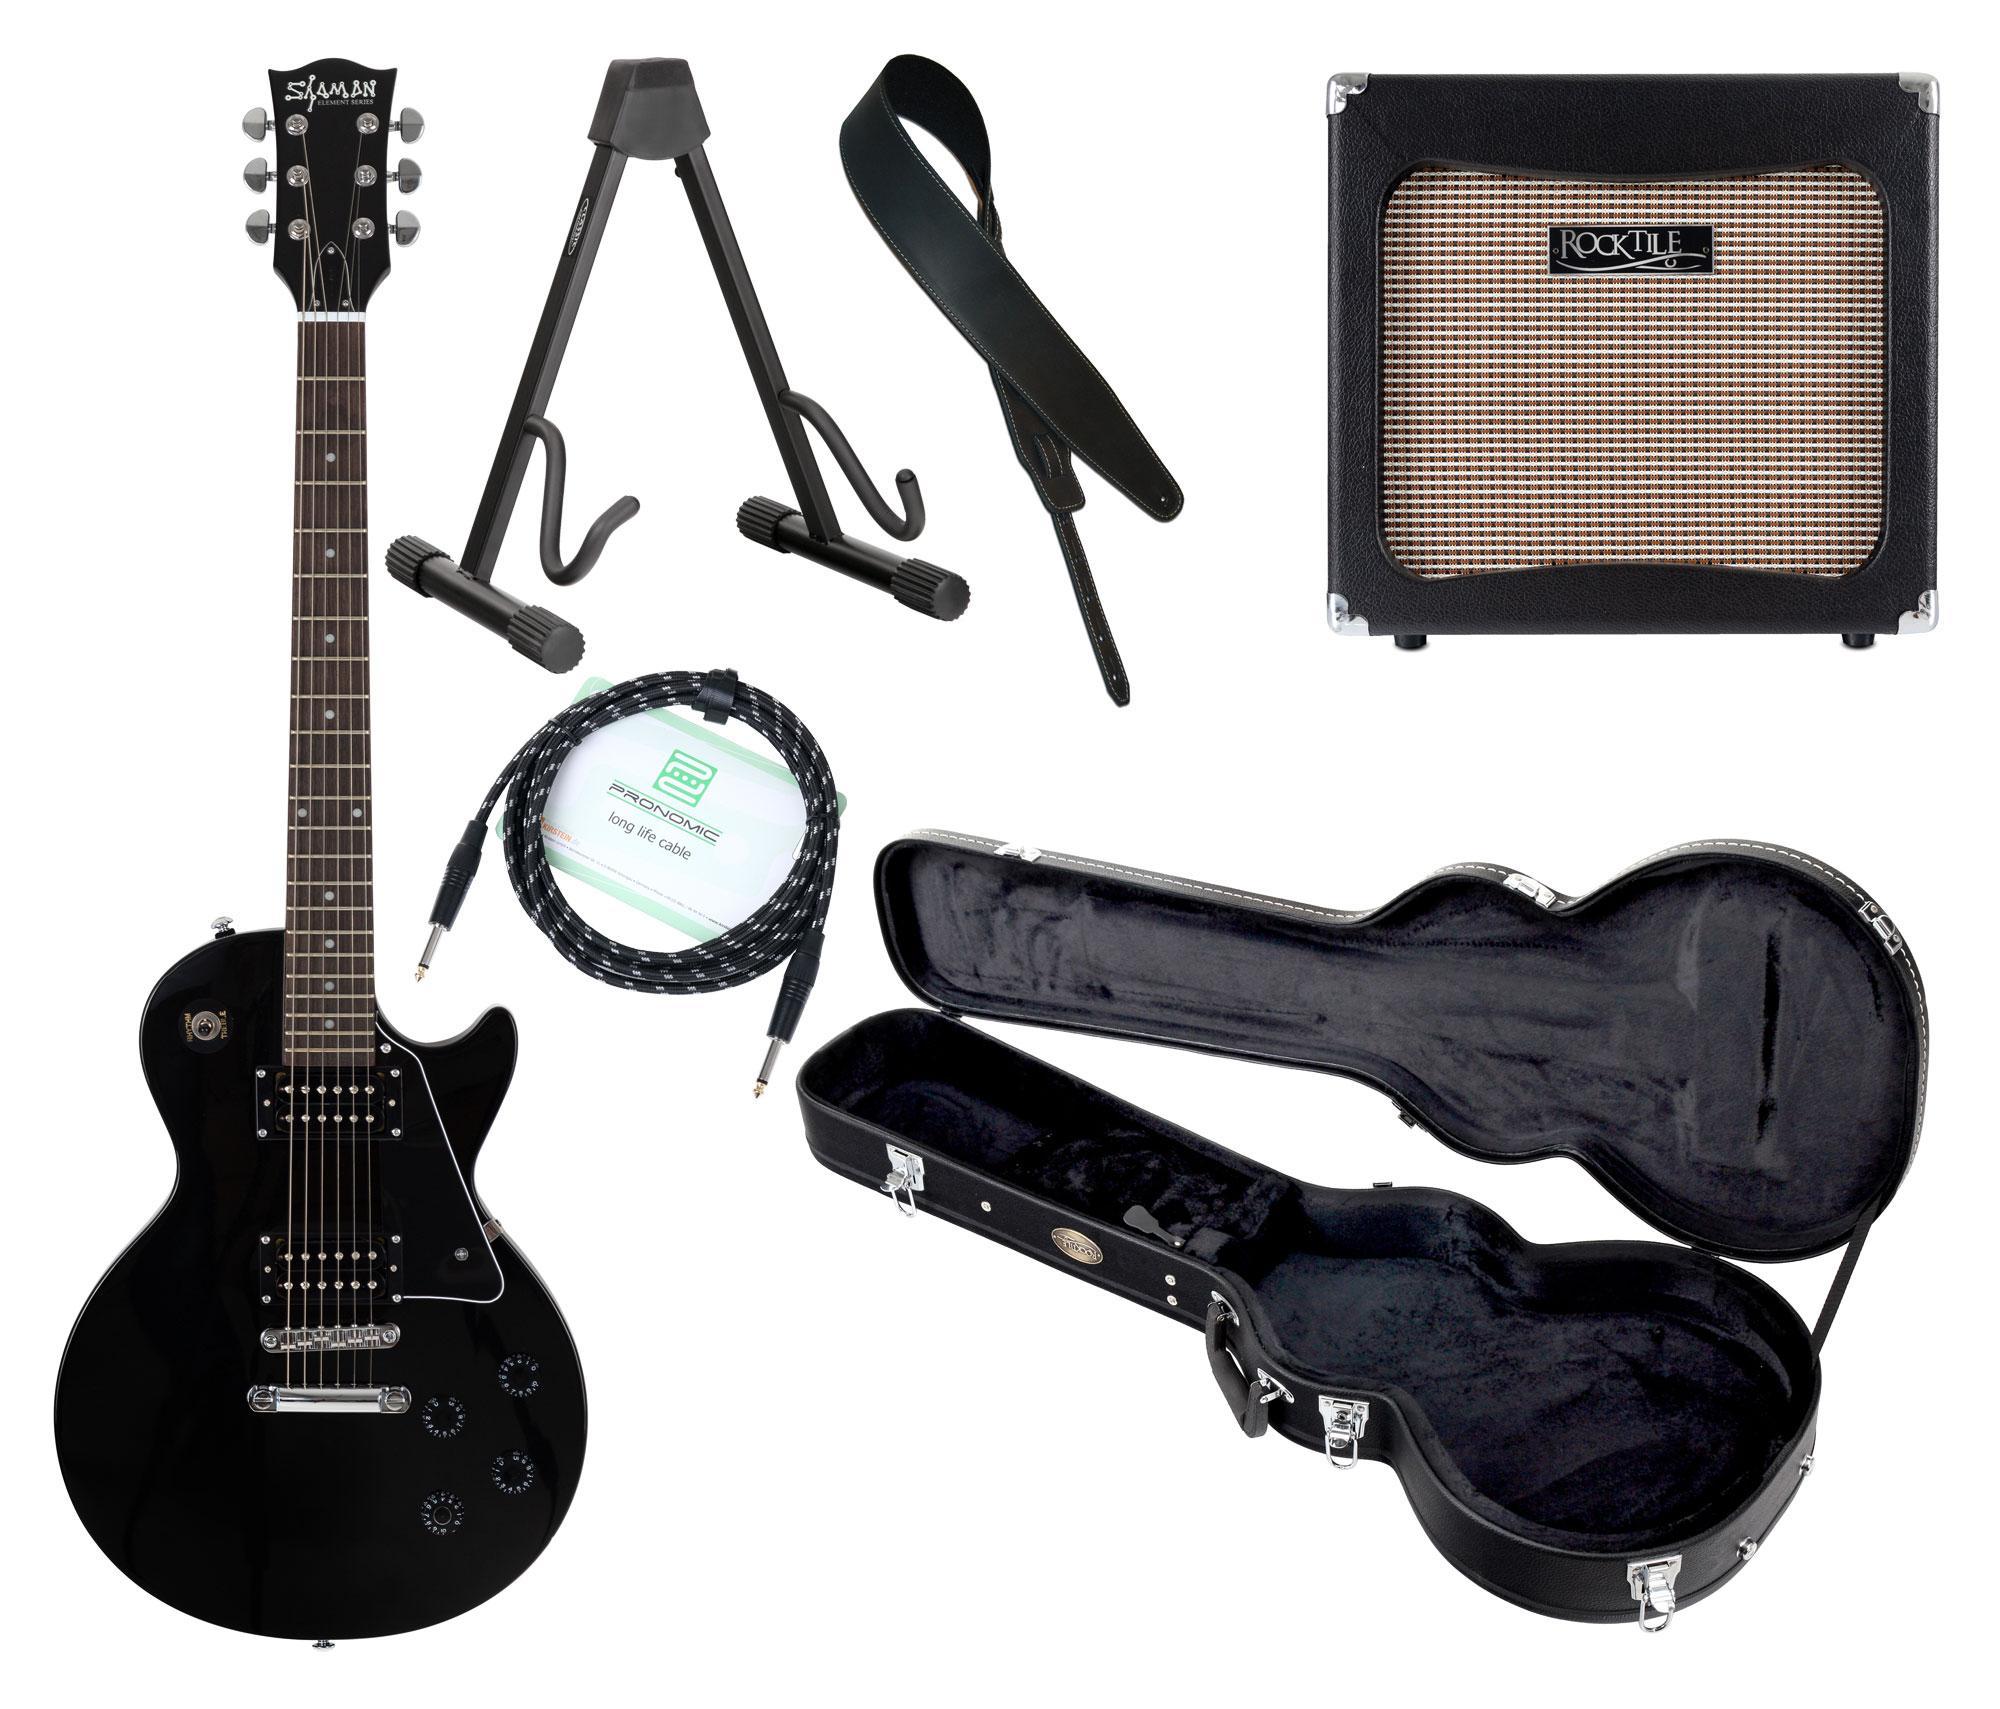 Egitarren - Shaman Element Series SCX 100B Komplett Set - Onlineshop Musikhaus Kirstein